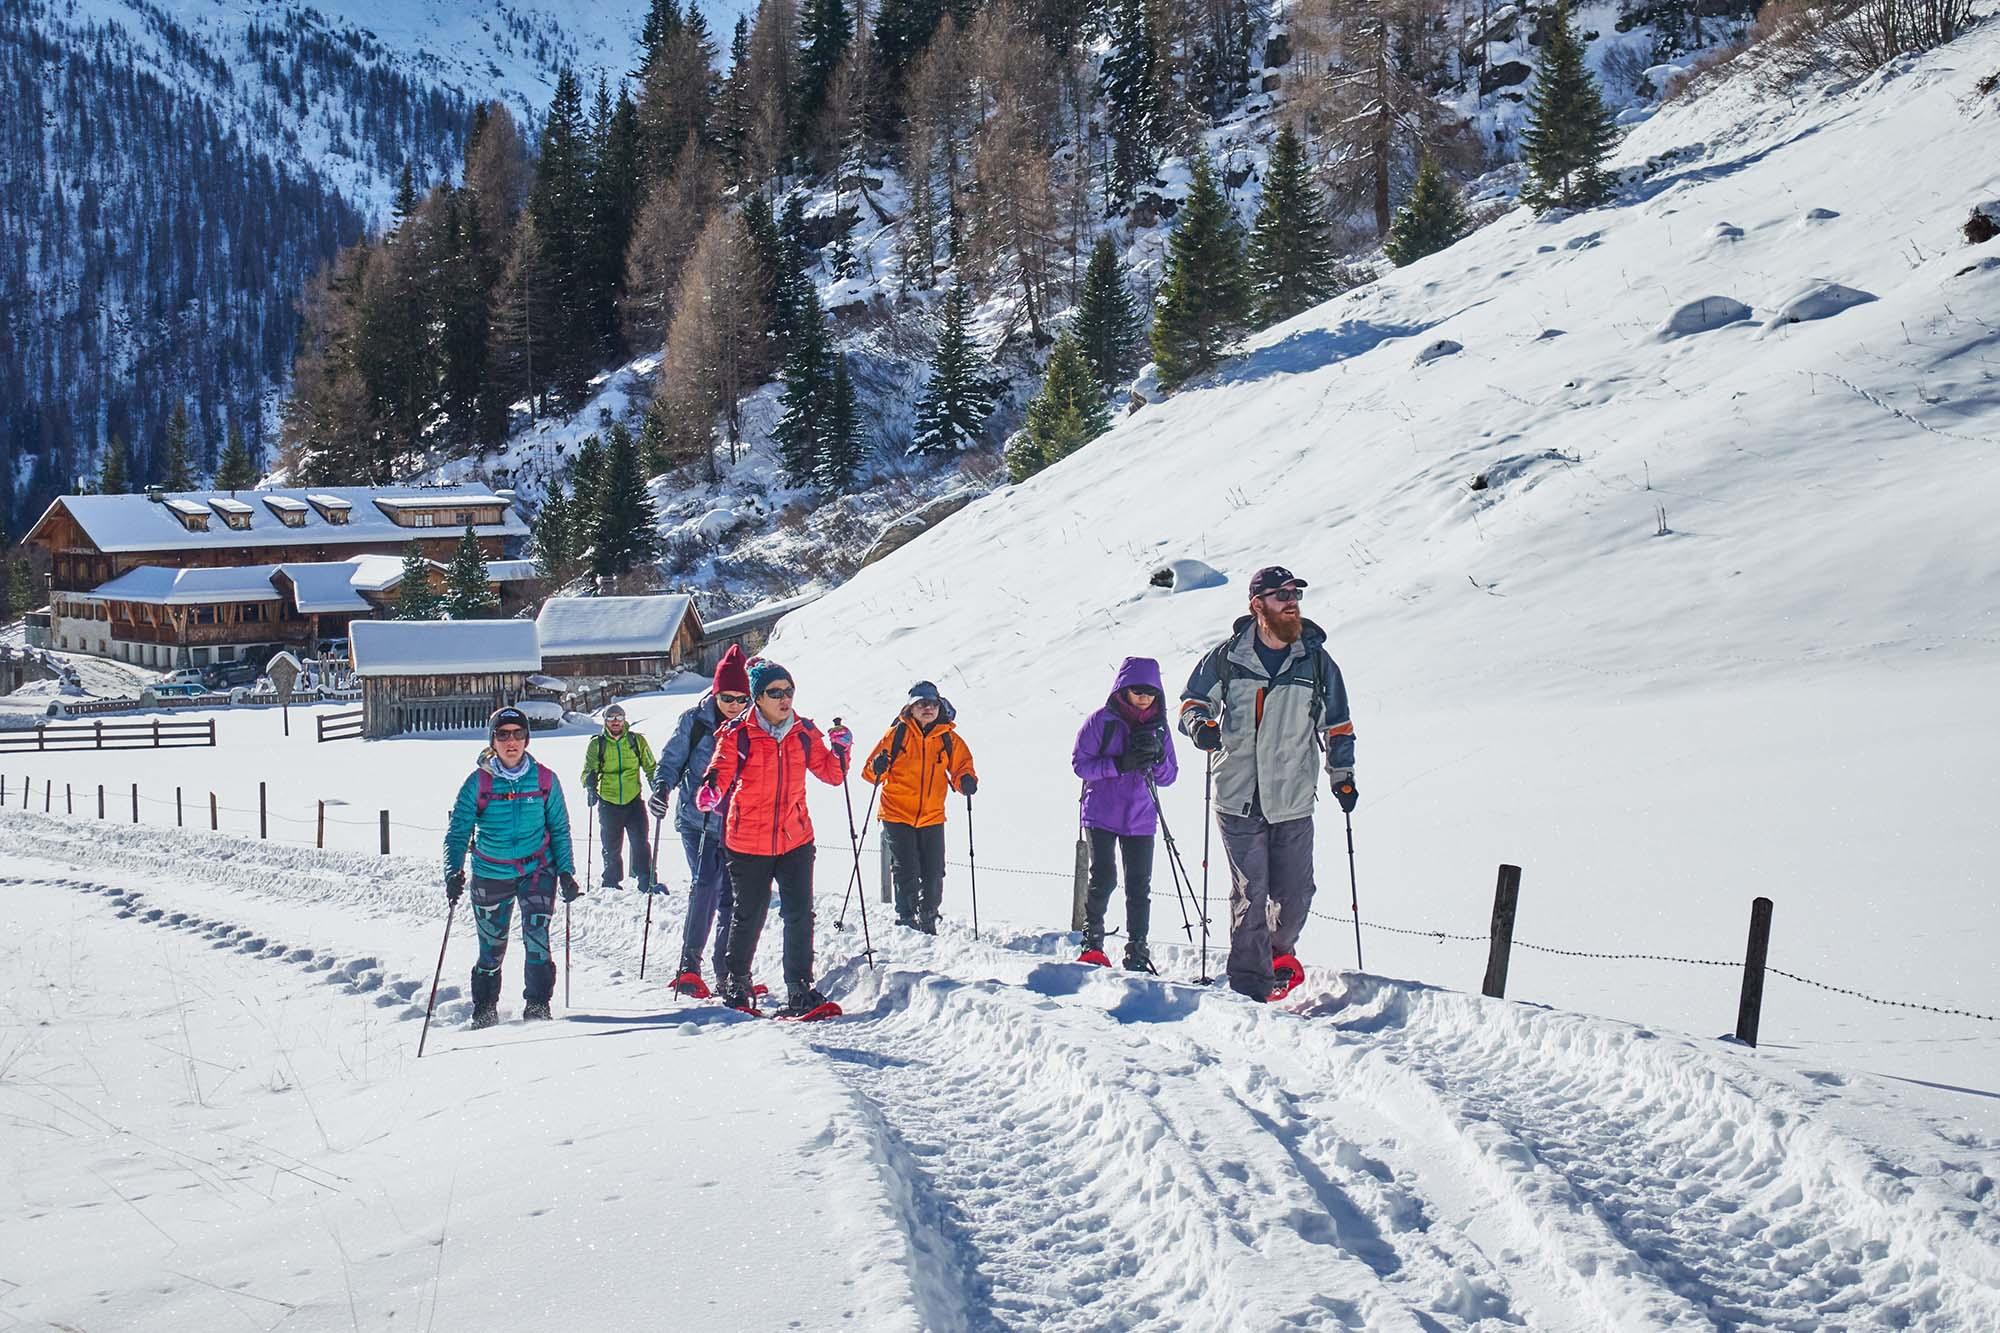 Austria winter holiday